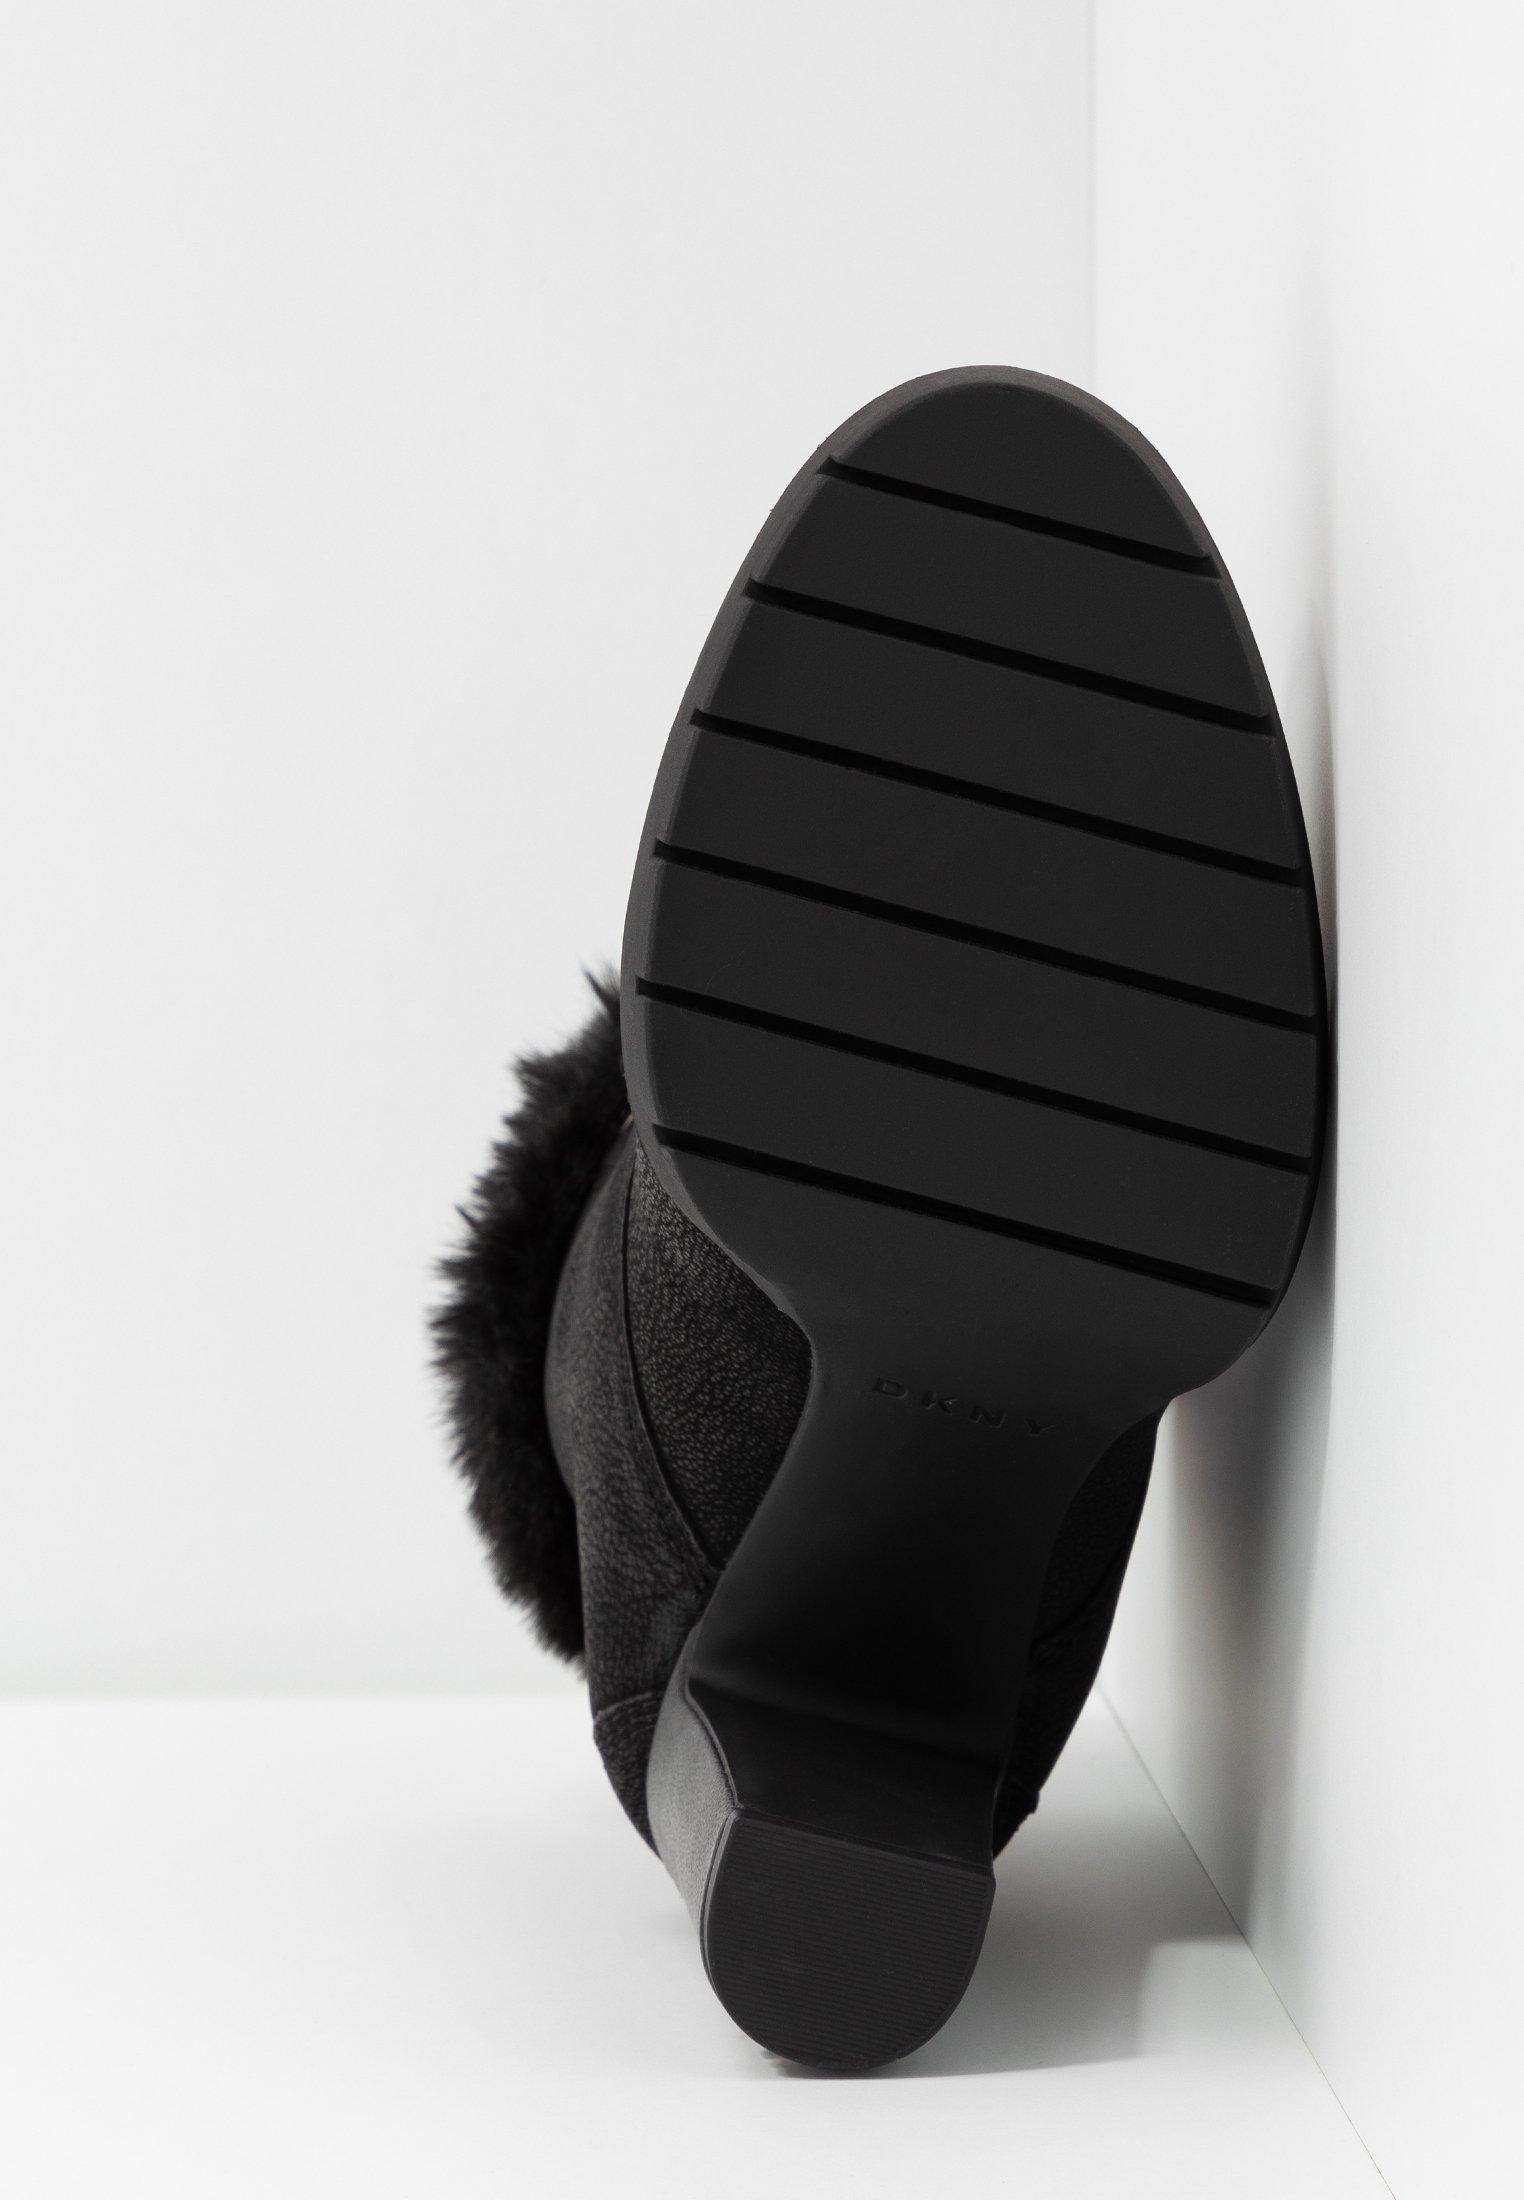 DKNY DARCY LACE UP BOOTIE - Ankelboots med høye hæler - black